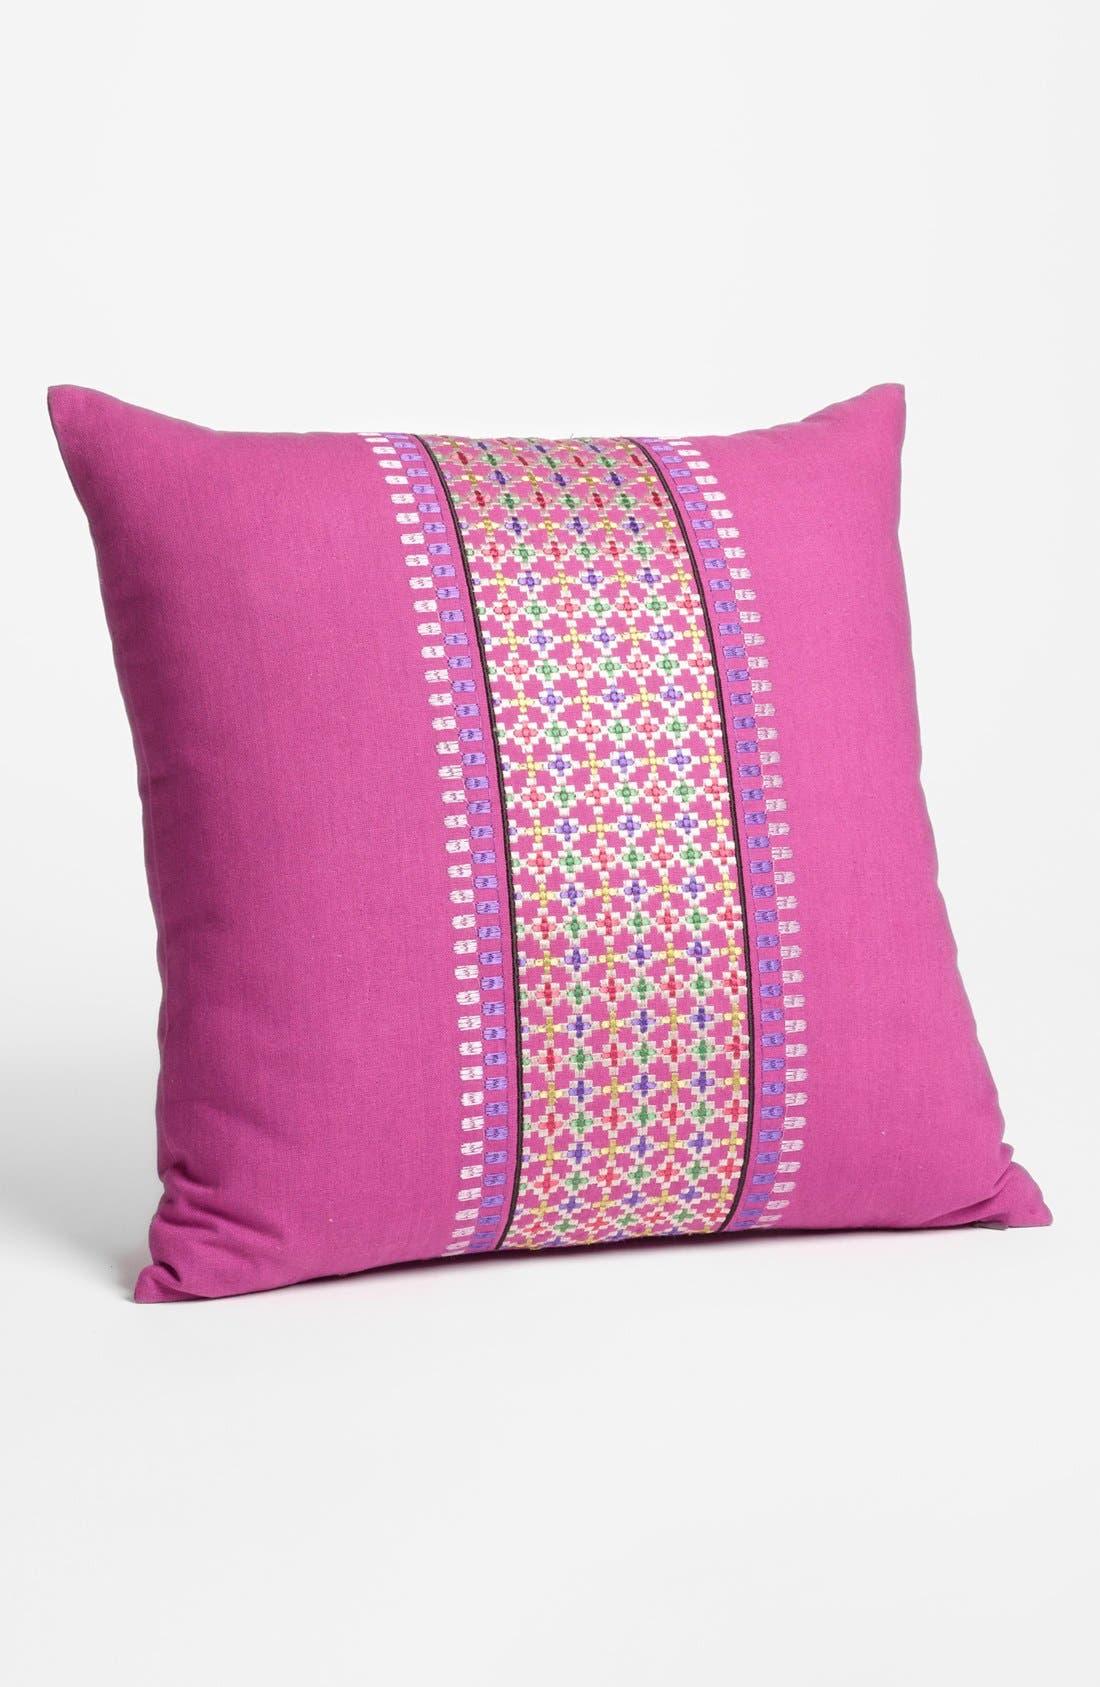 Alternate Image 1 Selected - Echo 'Vineyard' Pillow